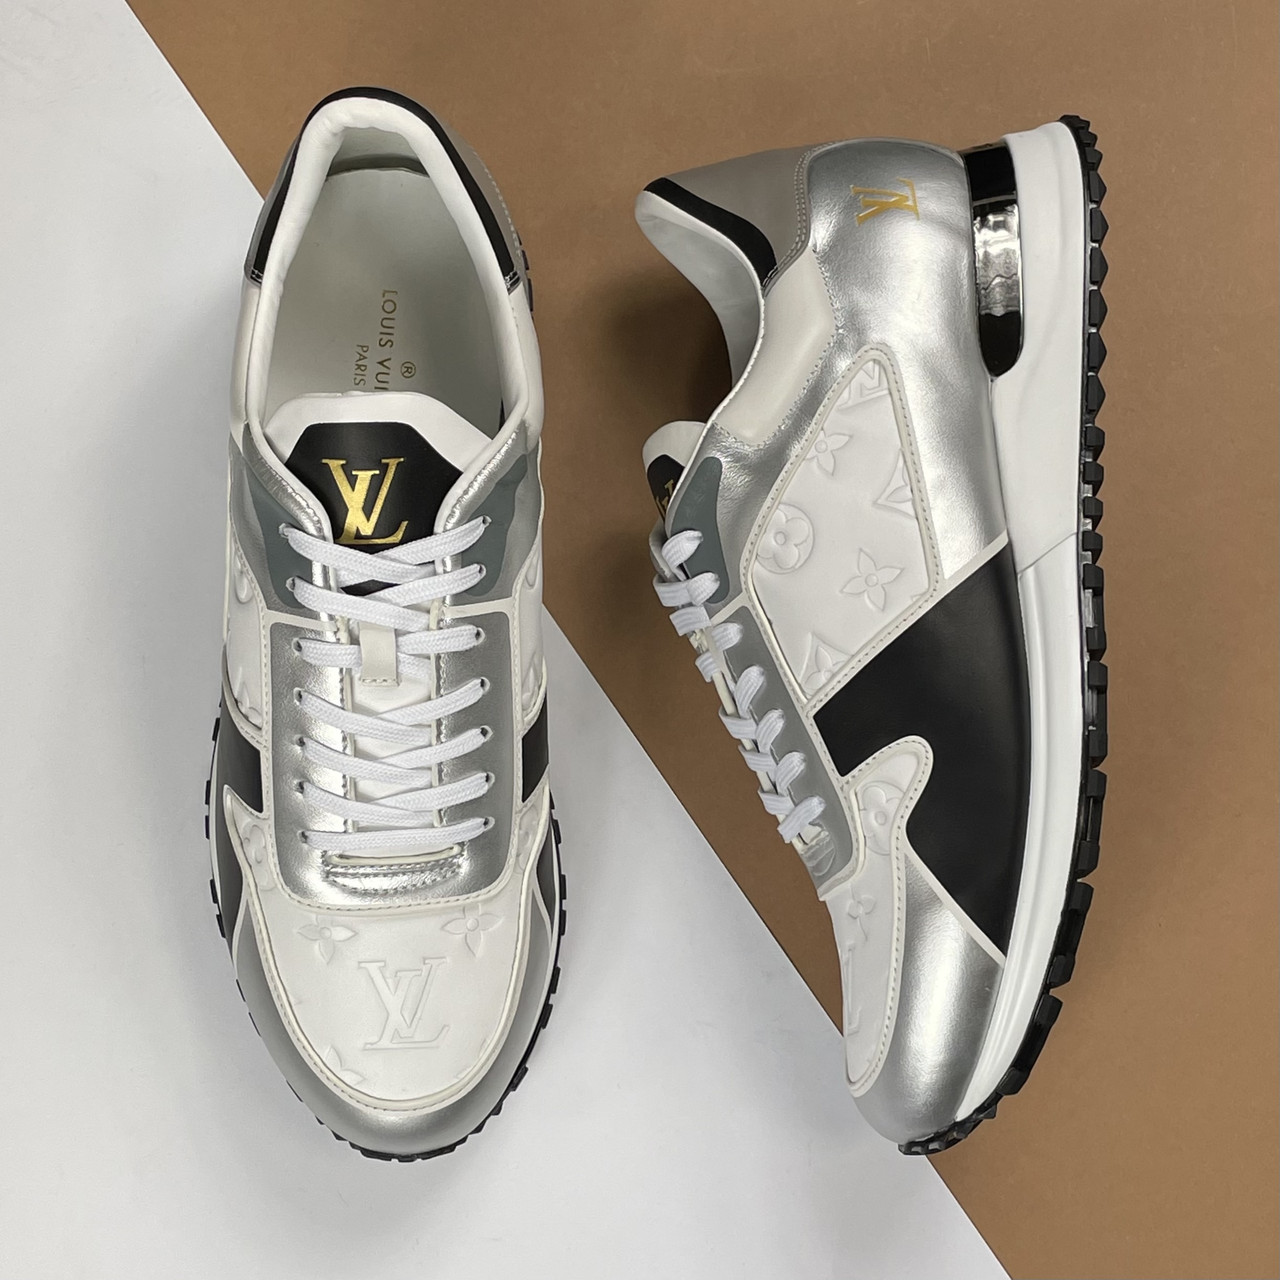 Кроссовки кожаные Louis Vuitton Run Away (Луи Виттон) арт. 39-208